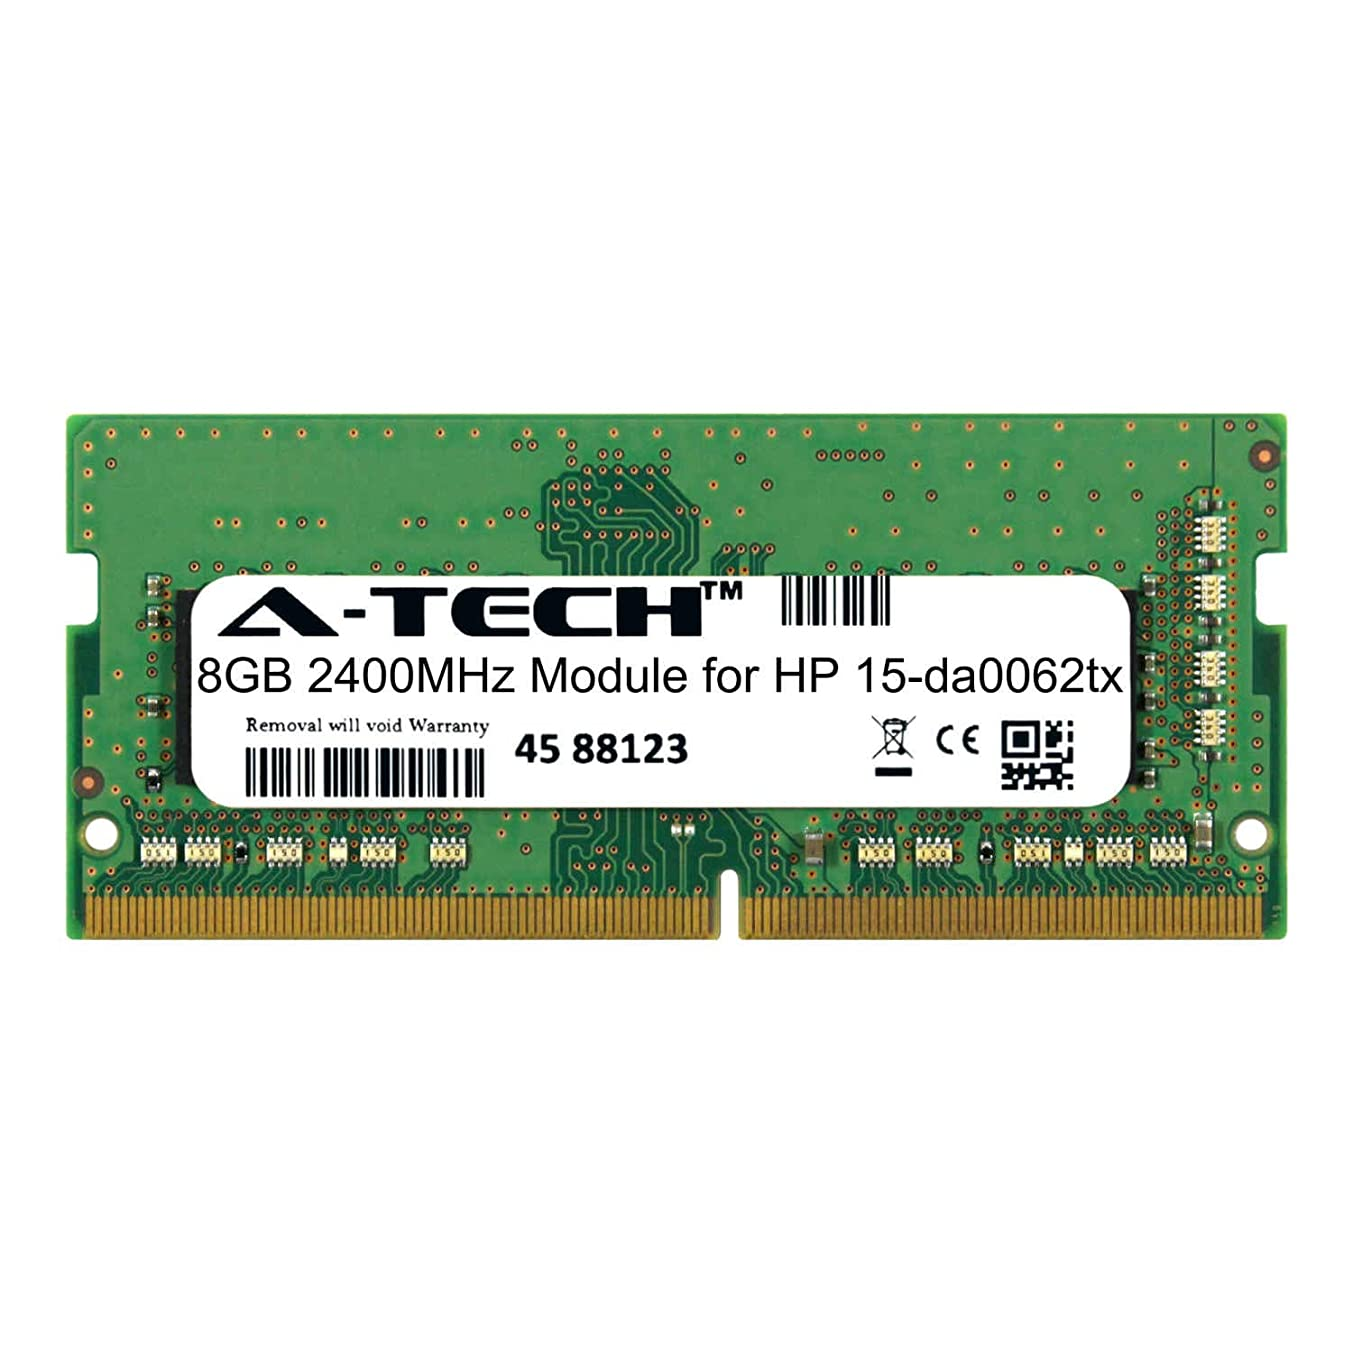 A-Tech 8GB Module for HP 15-da0062tx Laptop & Notebook Compatible DDR4 2400Mhz Memory Ram (ATMS381691A25827X1)